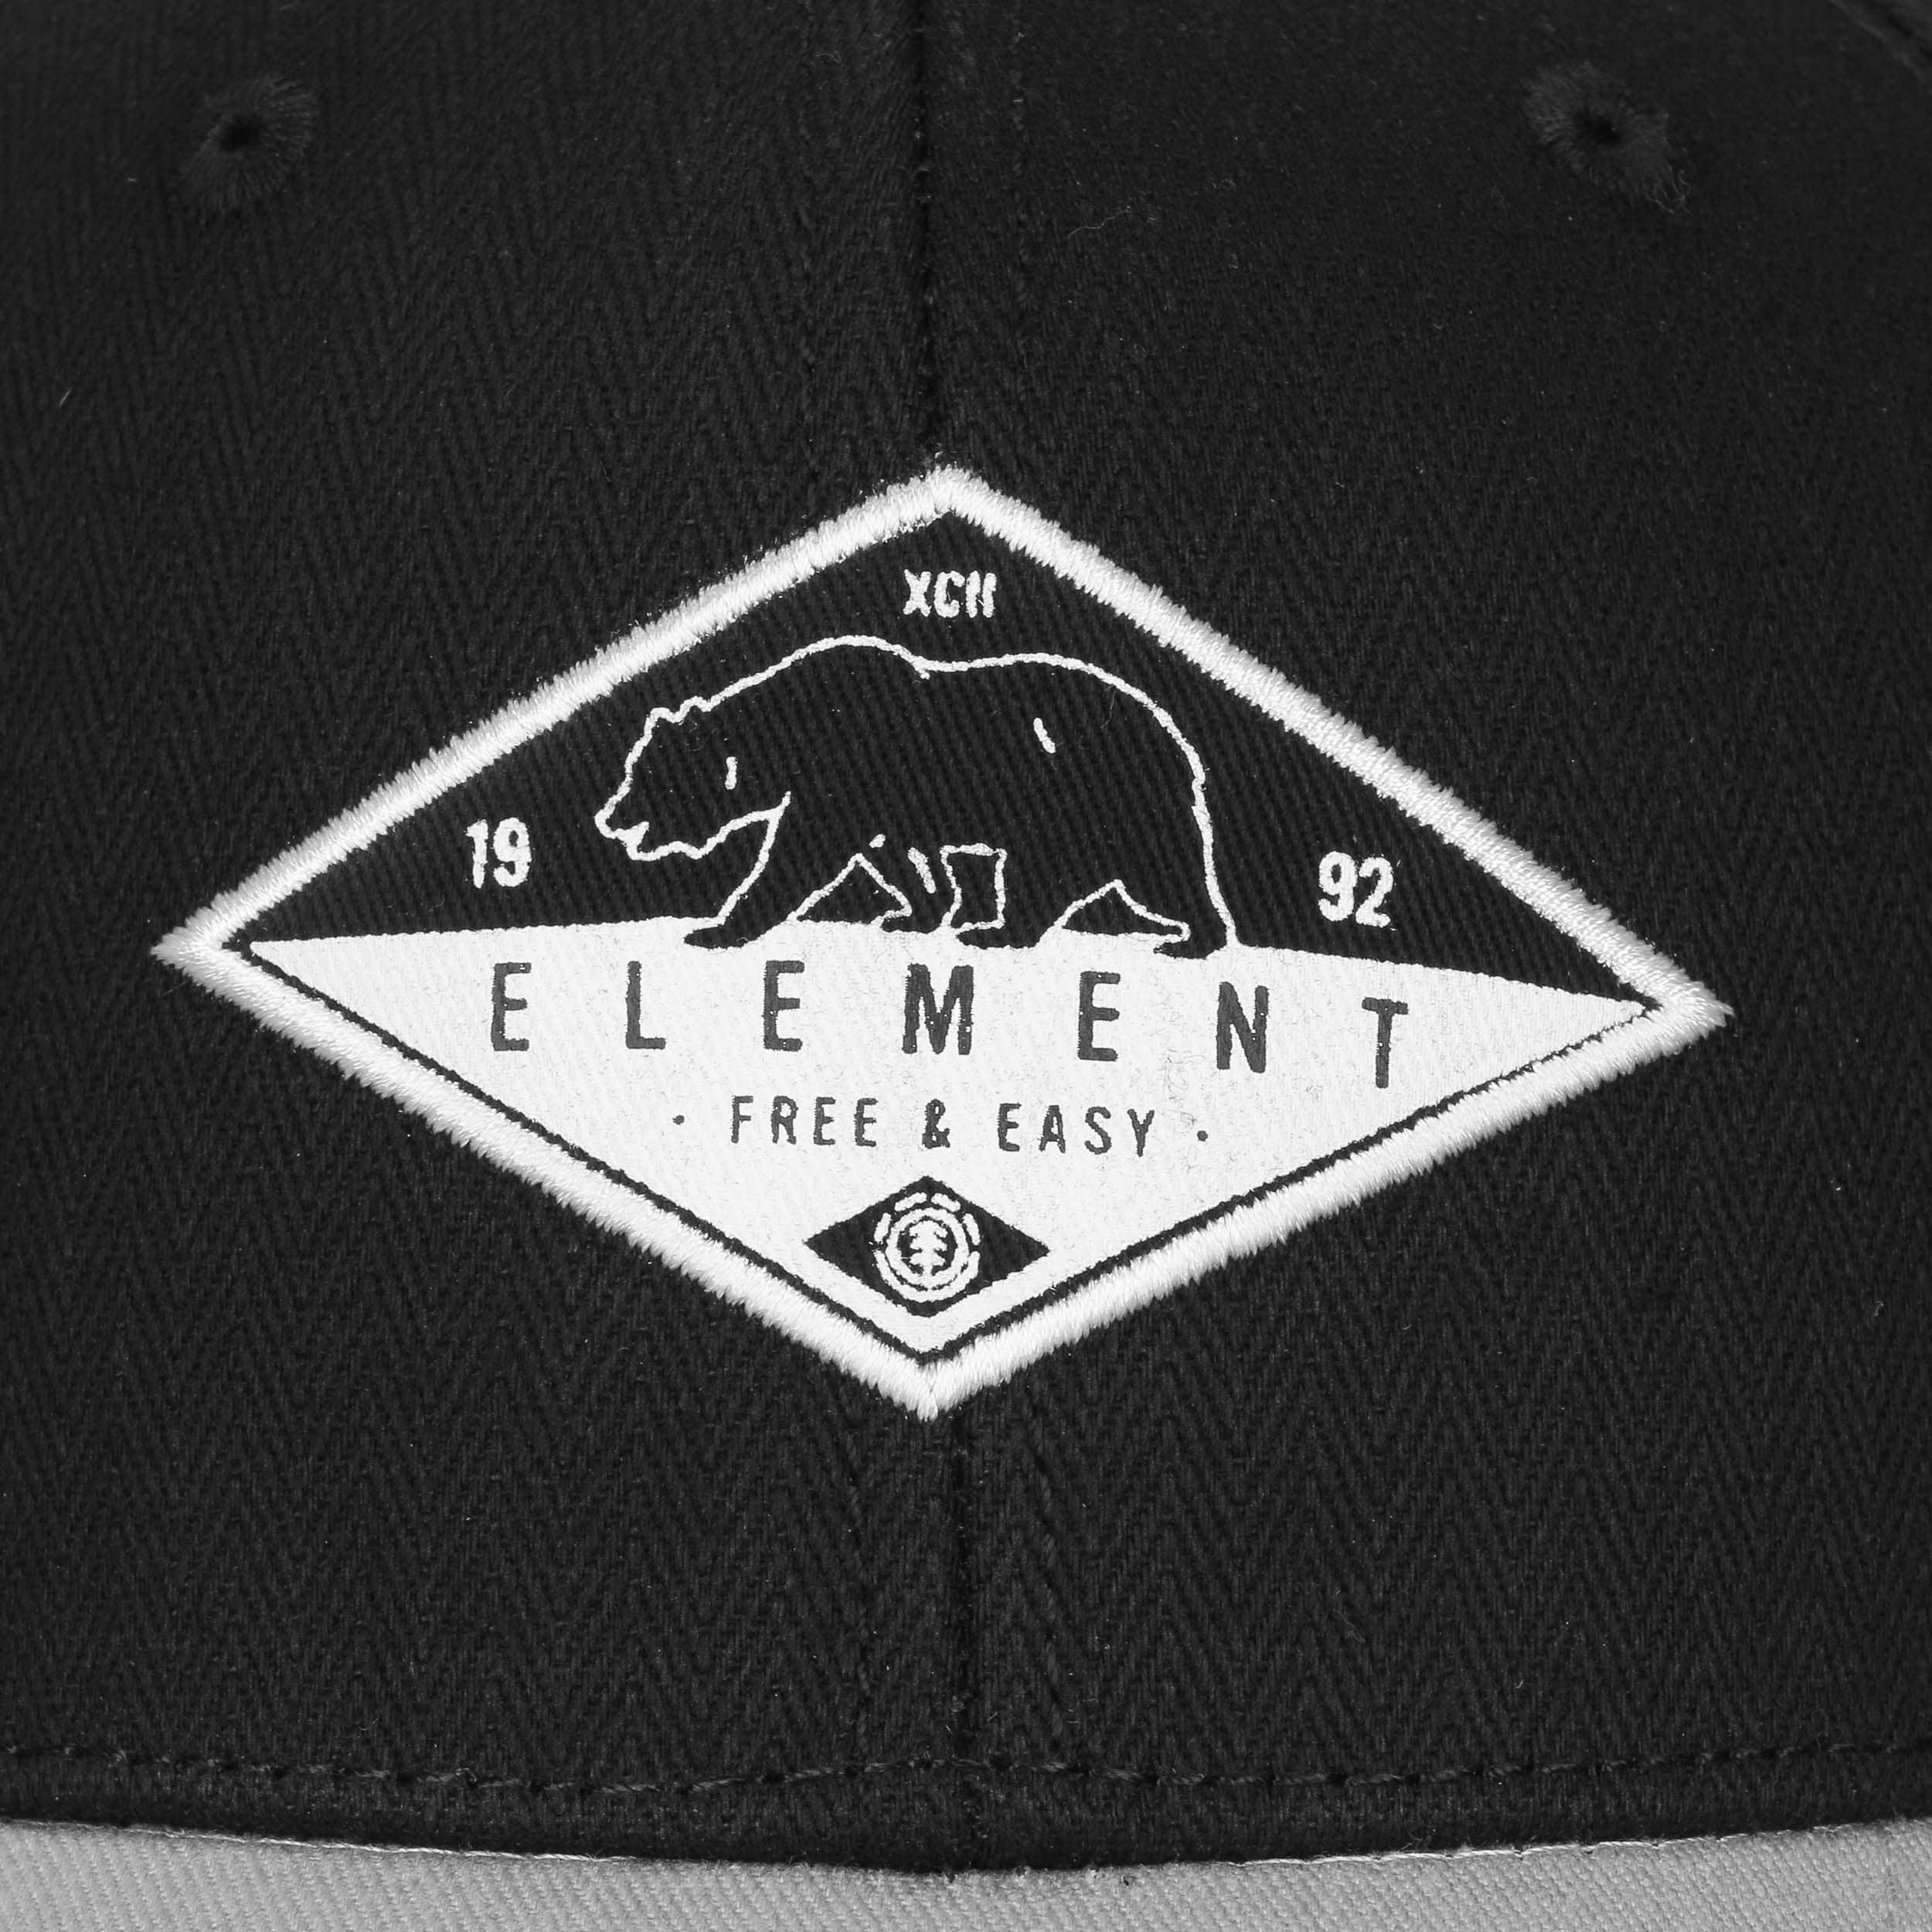 d42529fe939 ... Camp Snapback Cap by element - navy 5 ...